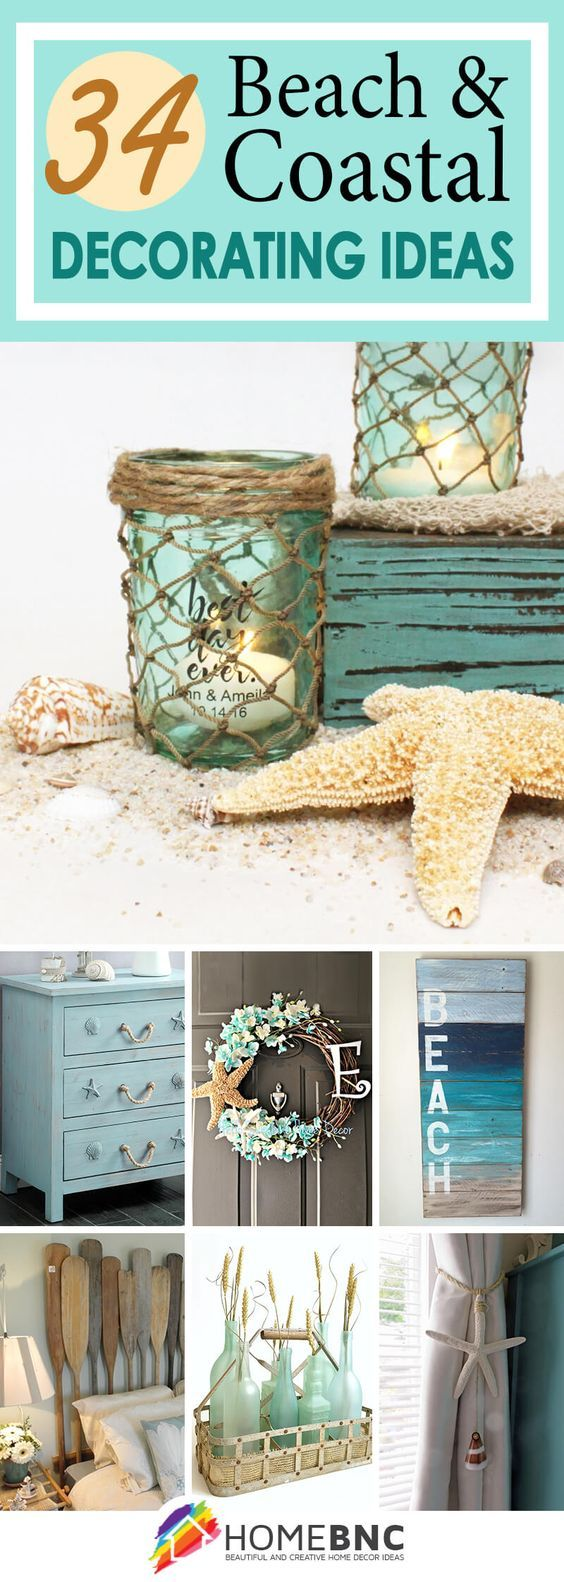 34 Beach And Coastal Decorating Ideas You'll Adore